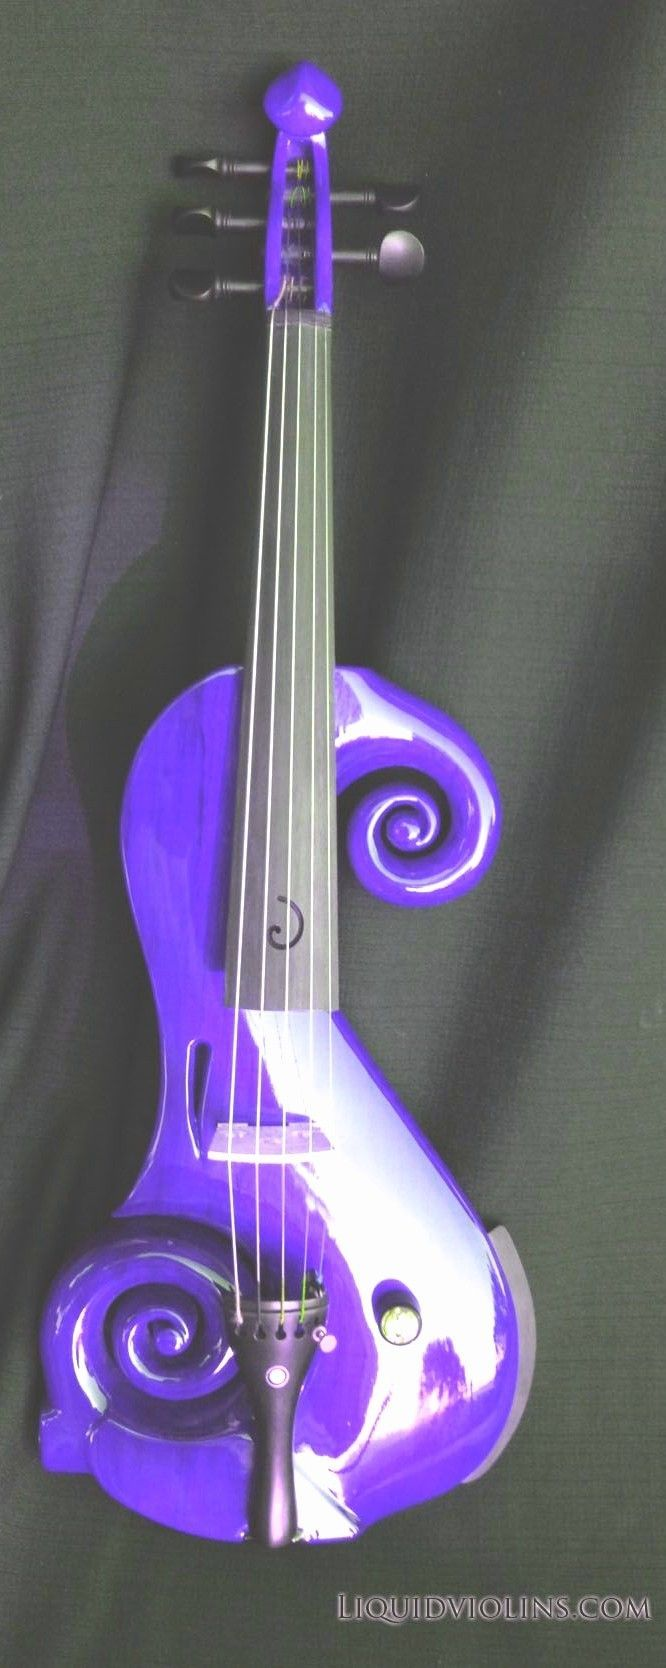 wasbella102: 4/4 size violin Professional grade, 5 string electric violin #ElectricViolin